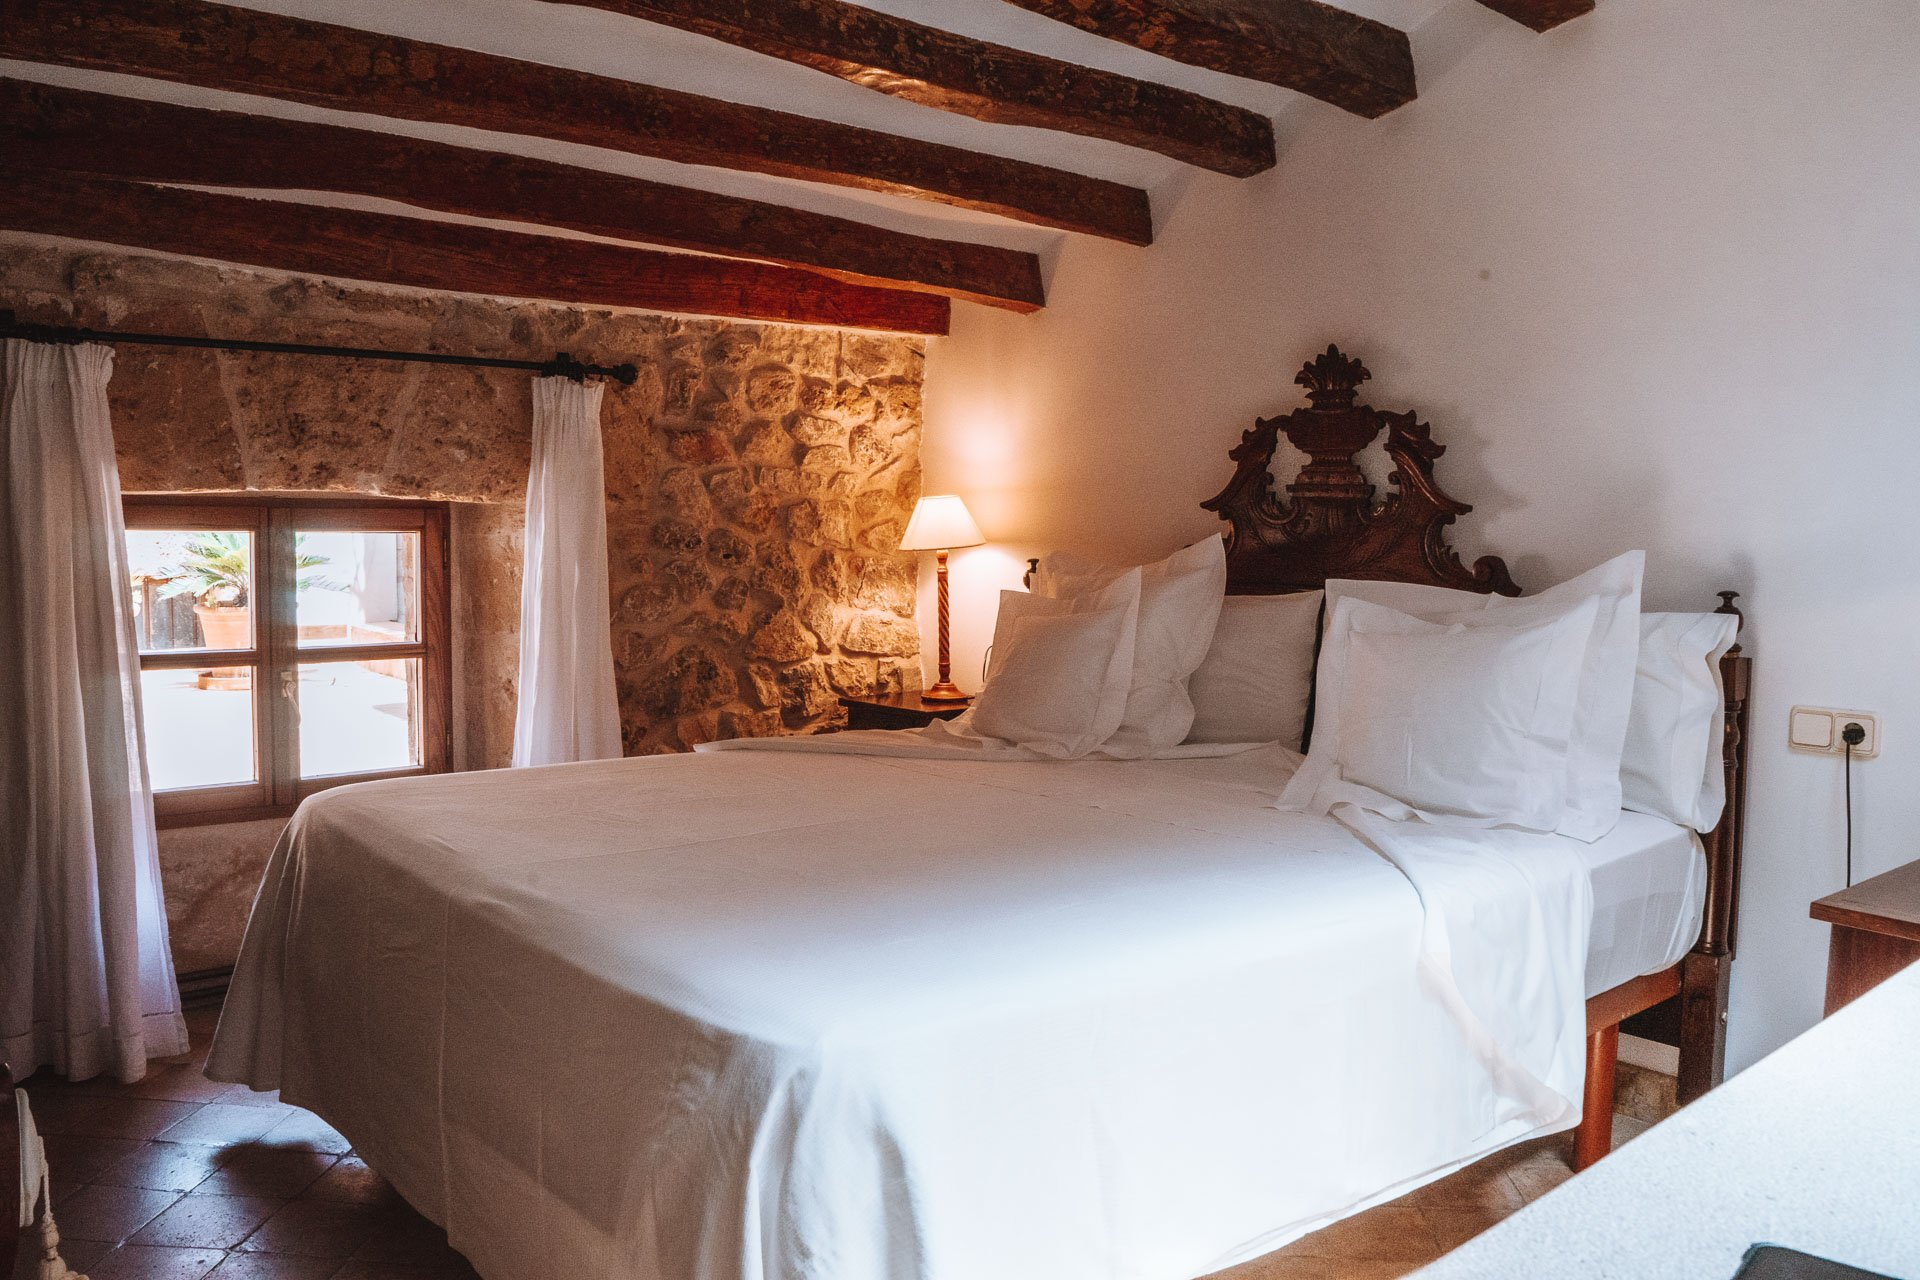 Cas Comte suits and spa, lloseta, Mallorca hotel, hotel in Mallorca, Adults only hotel in Mallorca, Mallorca holidays